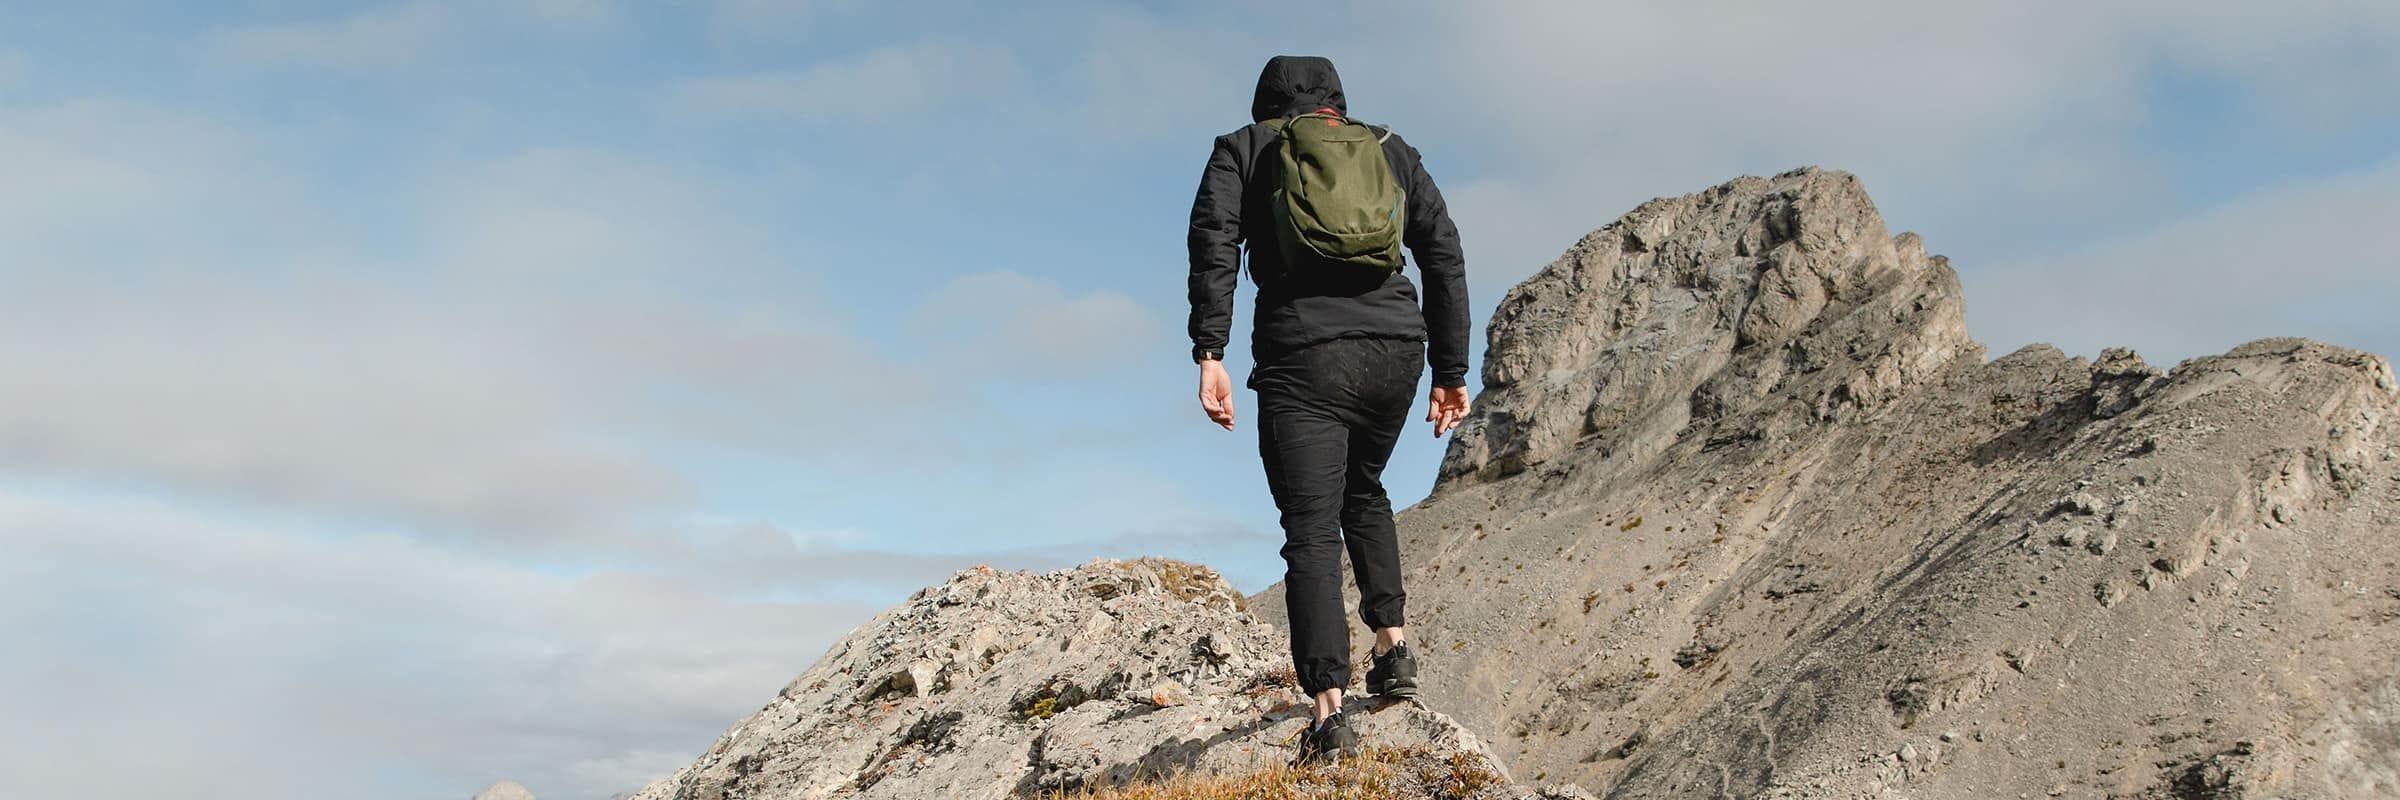 Hiking & Trekking, Salewa. Tired of Your Hiking Shoes Failing You? Salewa MTN Trainer GTX Reviewed